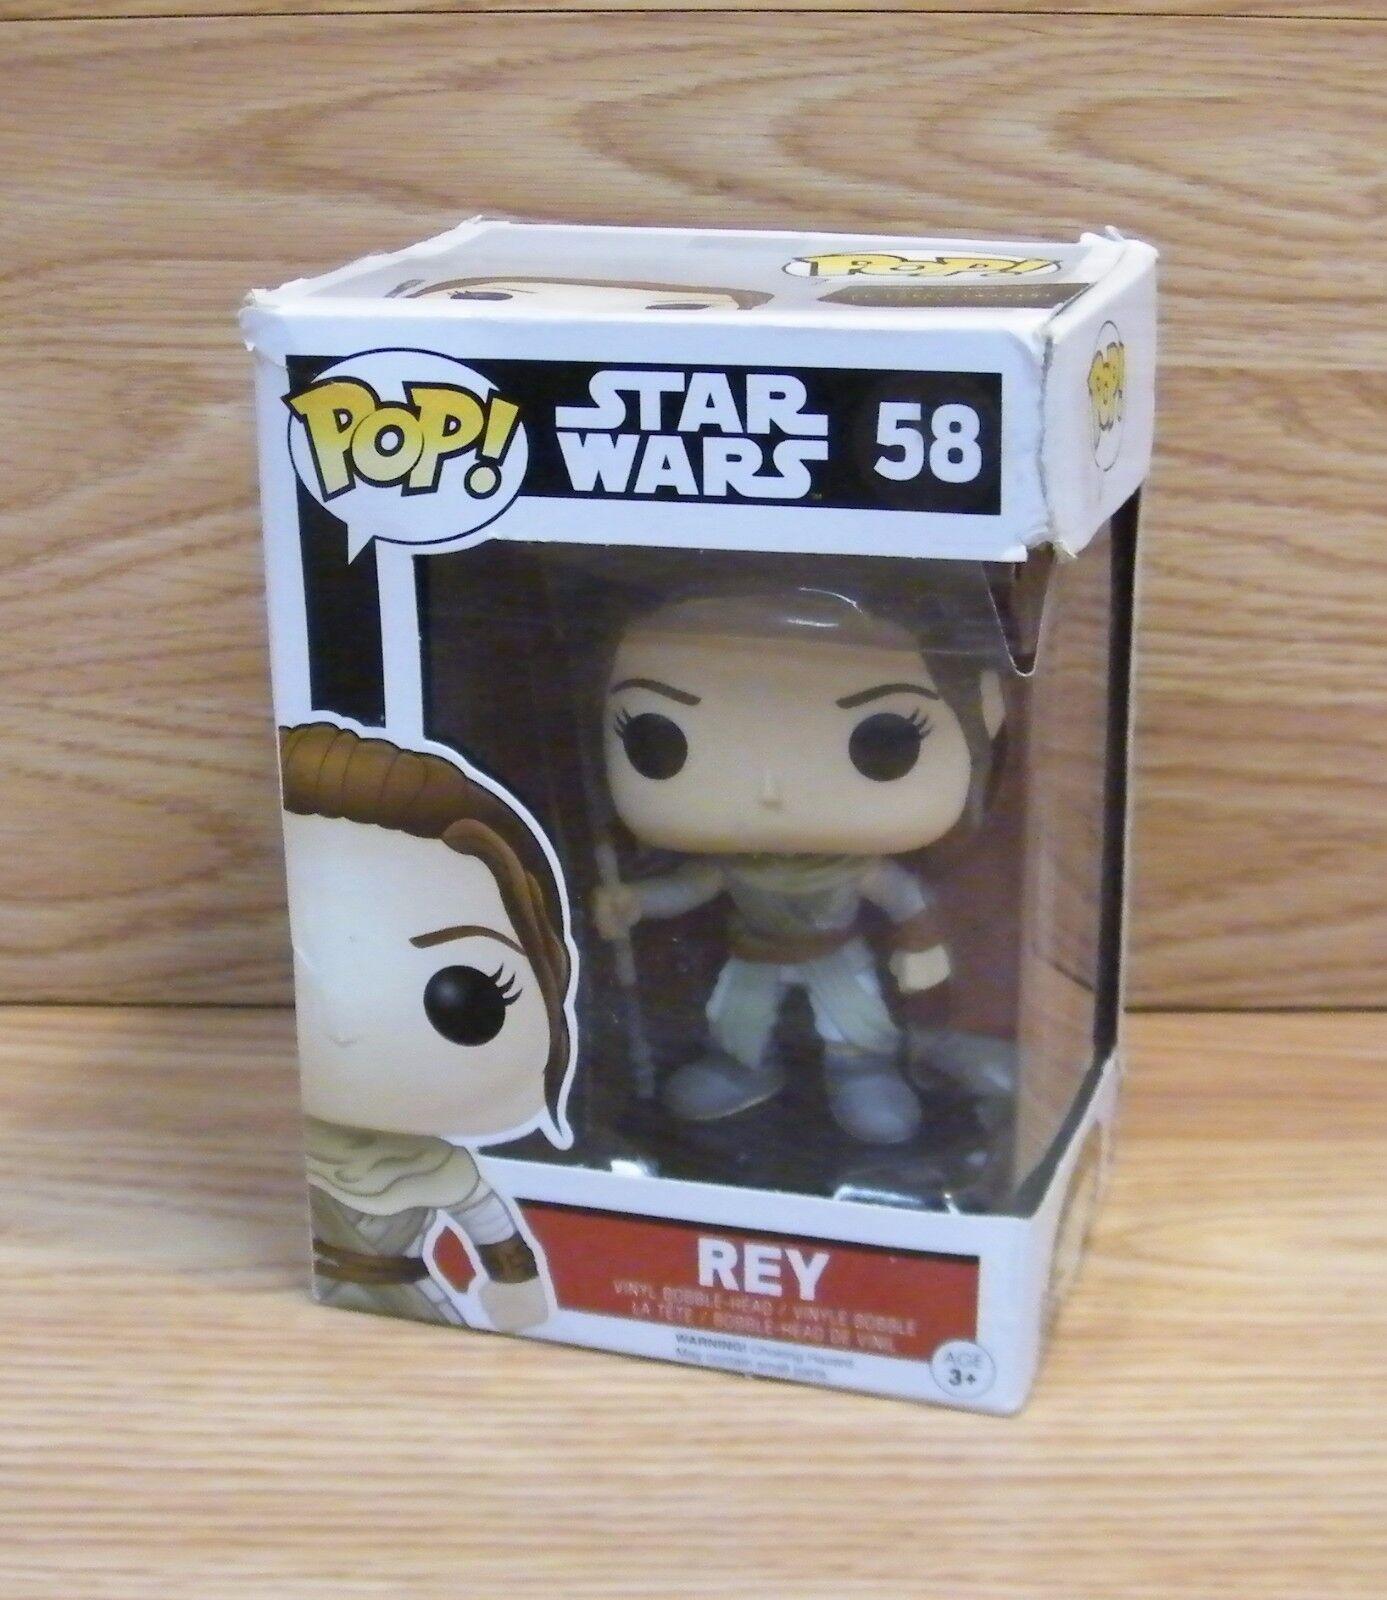 Vinyl Figure Rey #58 Genuine Star Wars Pop